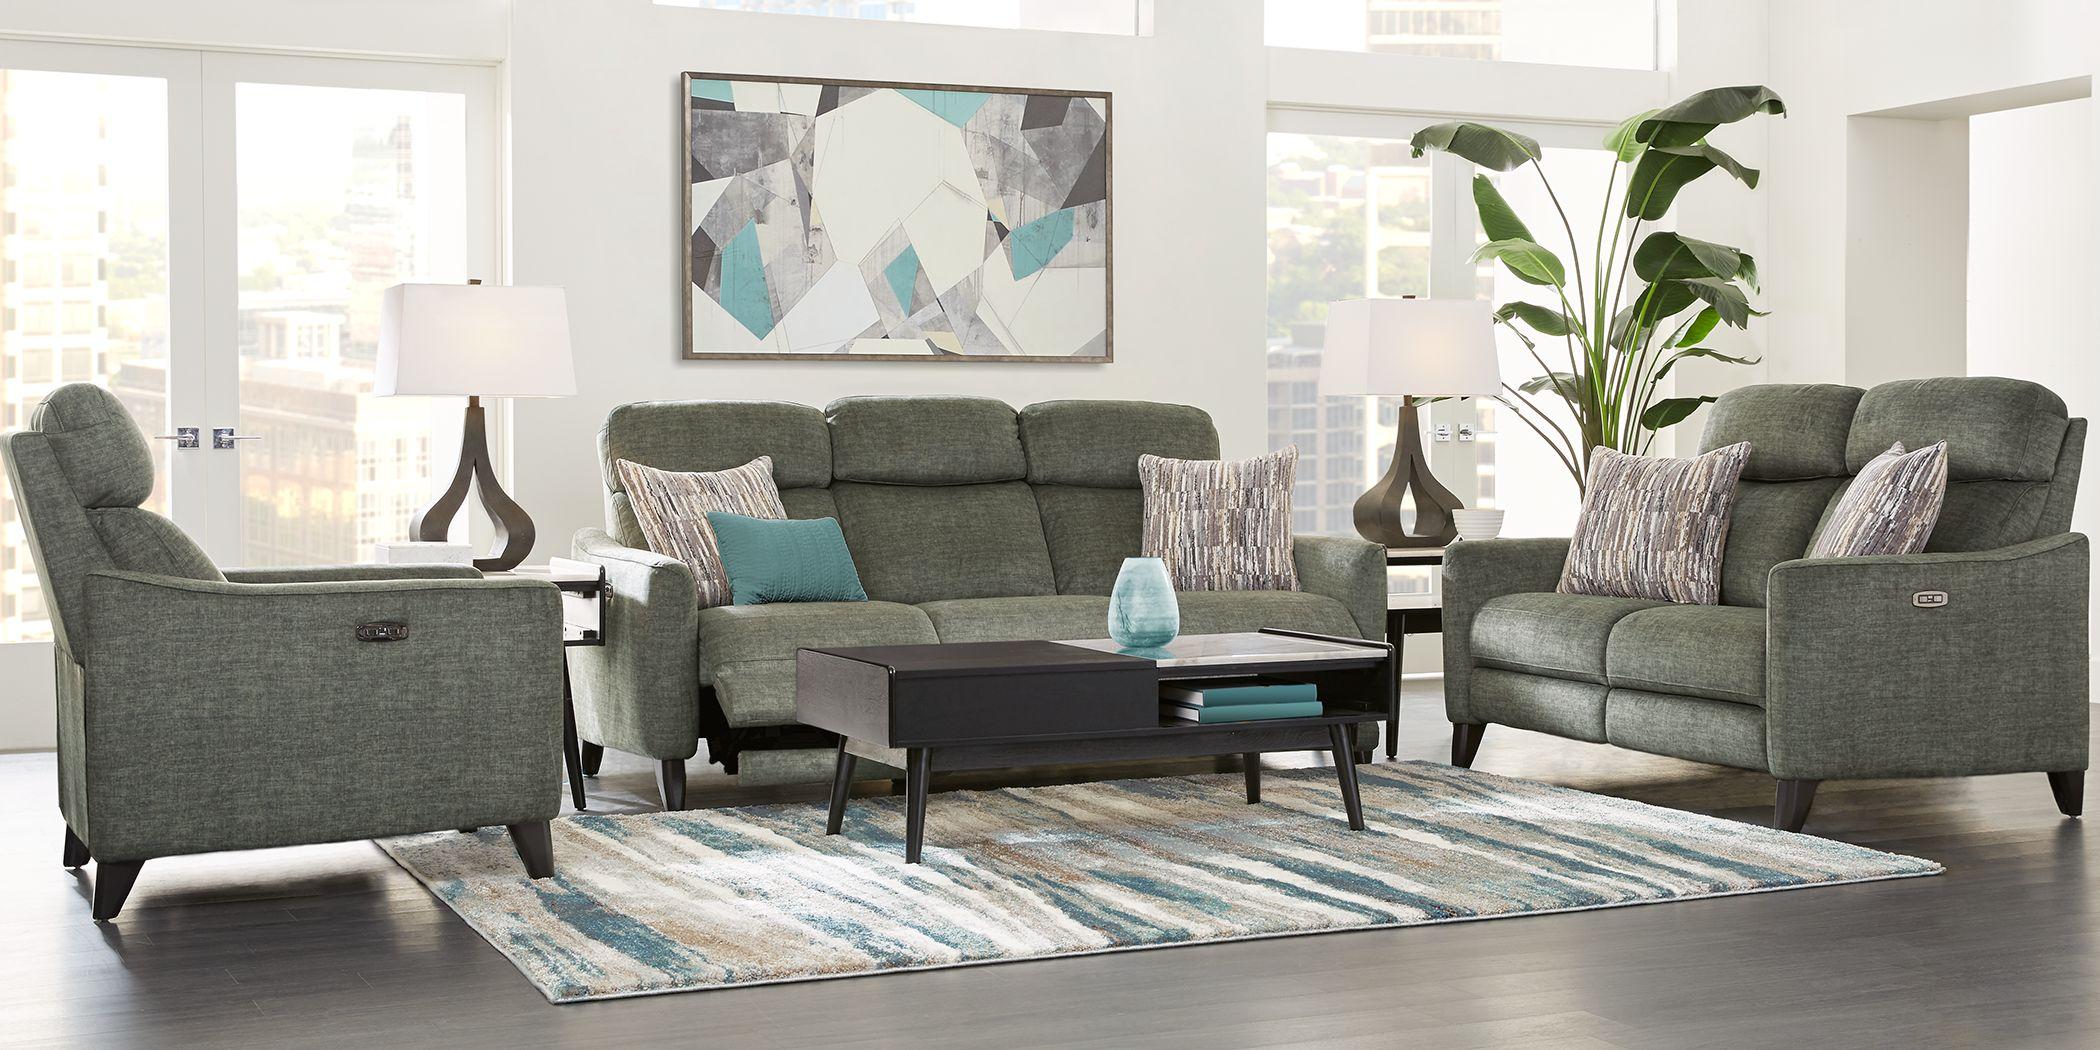 Pierceton Gray 5 Pc Living Room with Dual Power Reclining Sofa